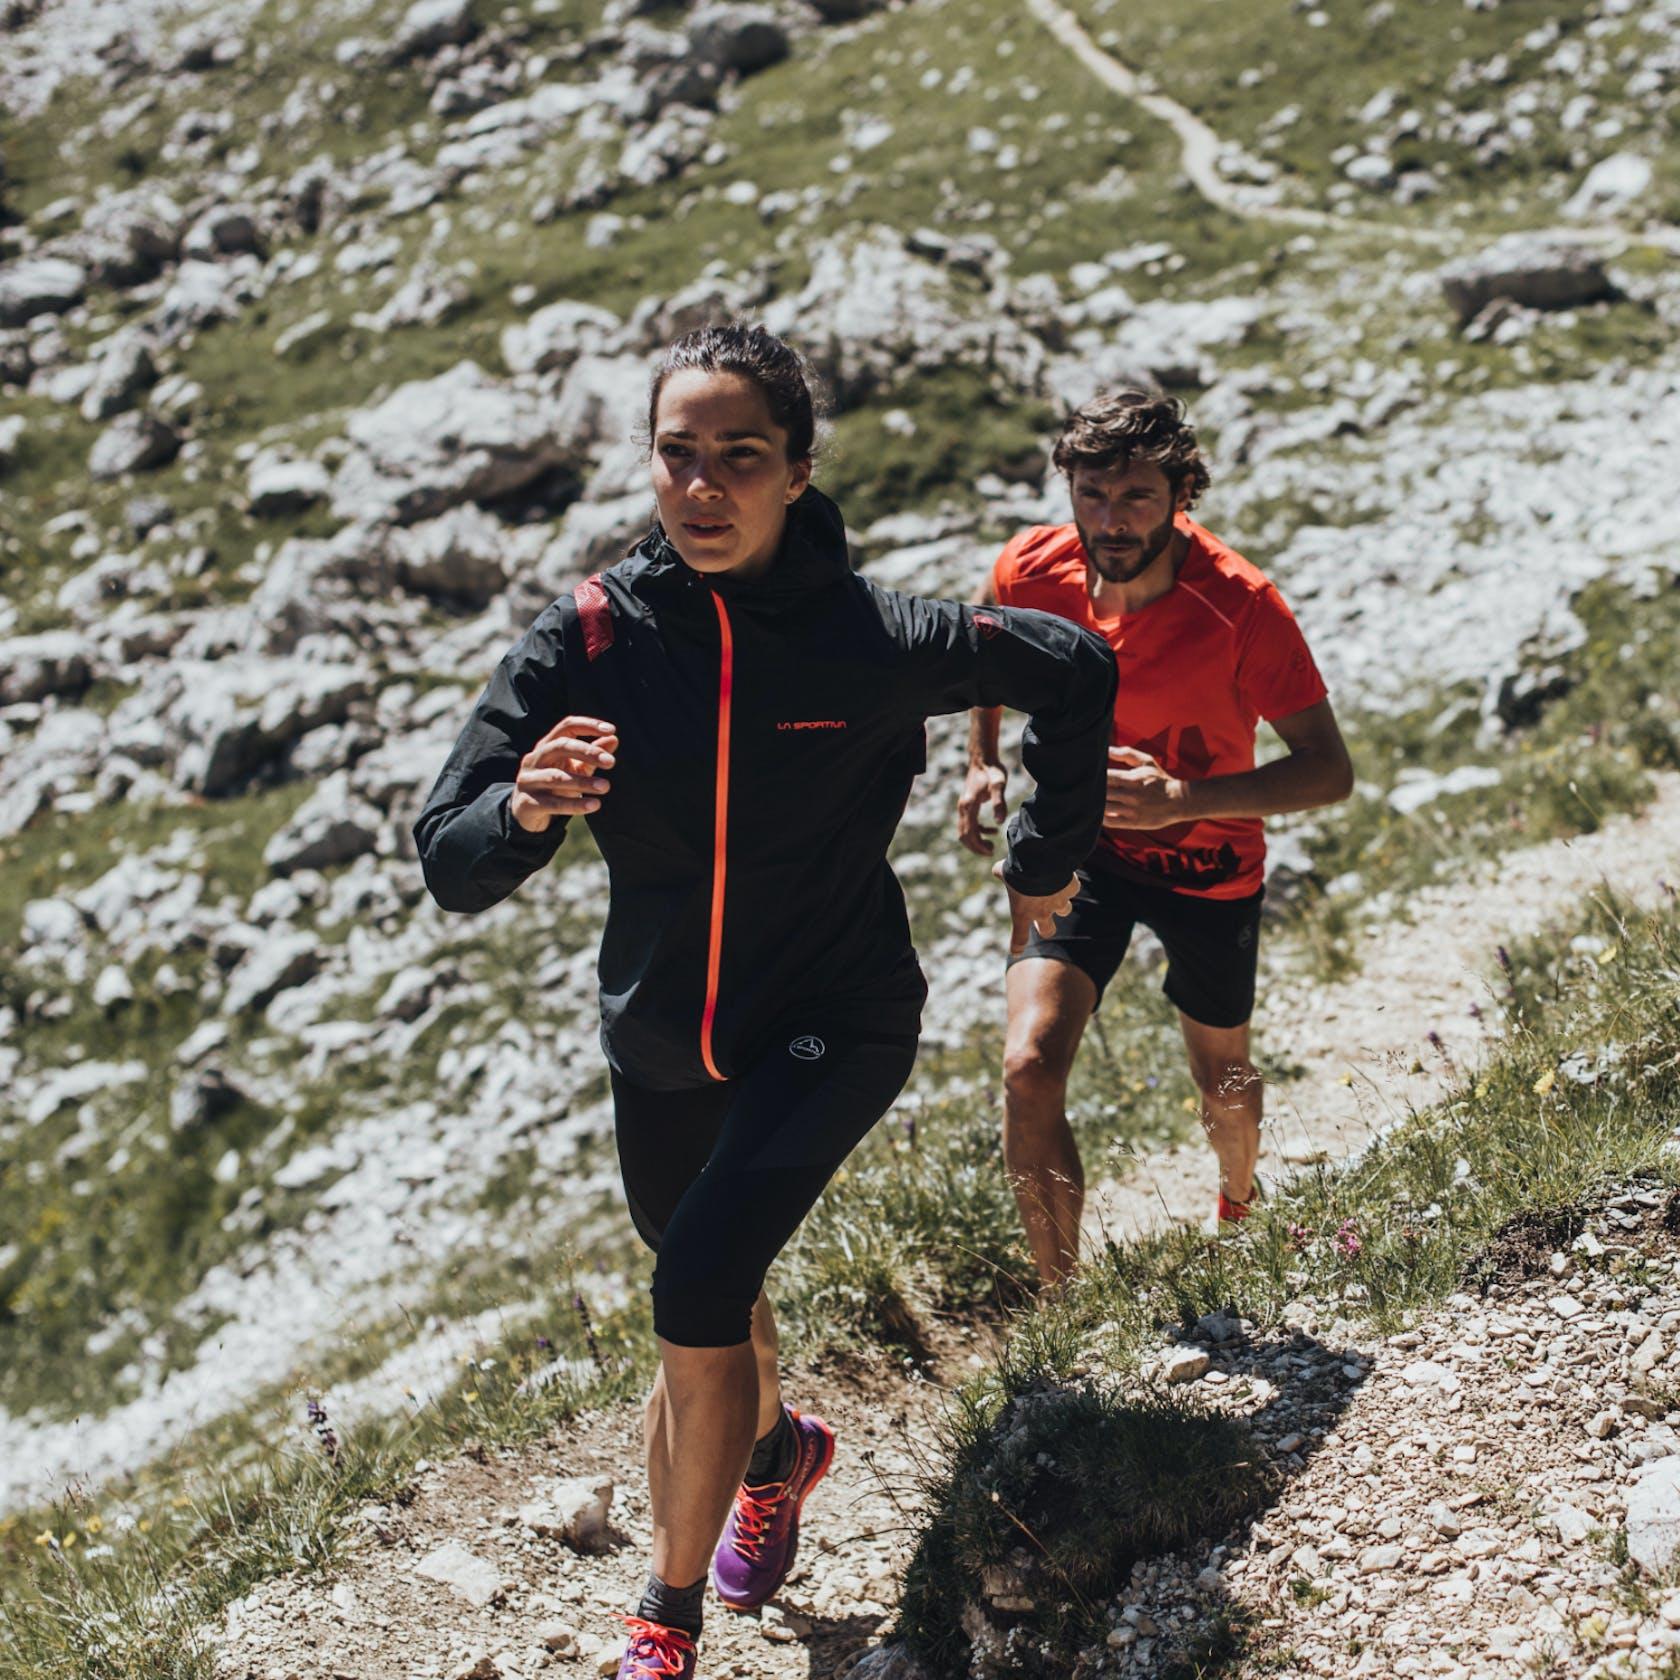 Trailrunning Bekleidung SPORTLER Onlineshop